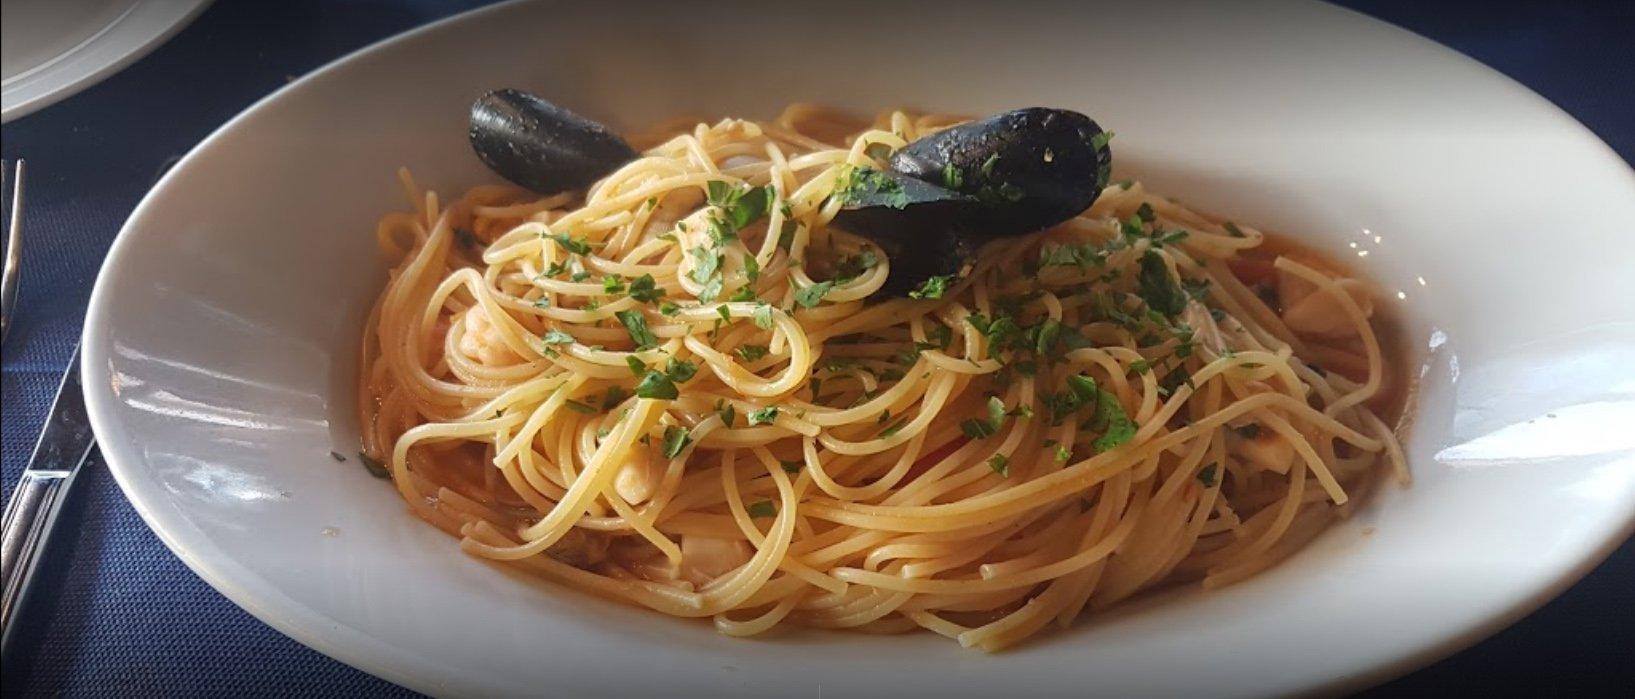 spaghettata con le cozze a Taranto